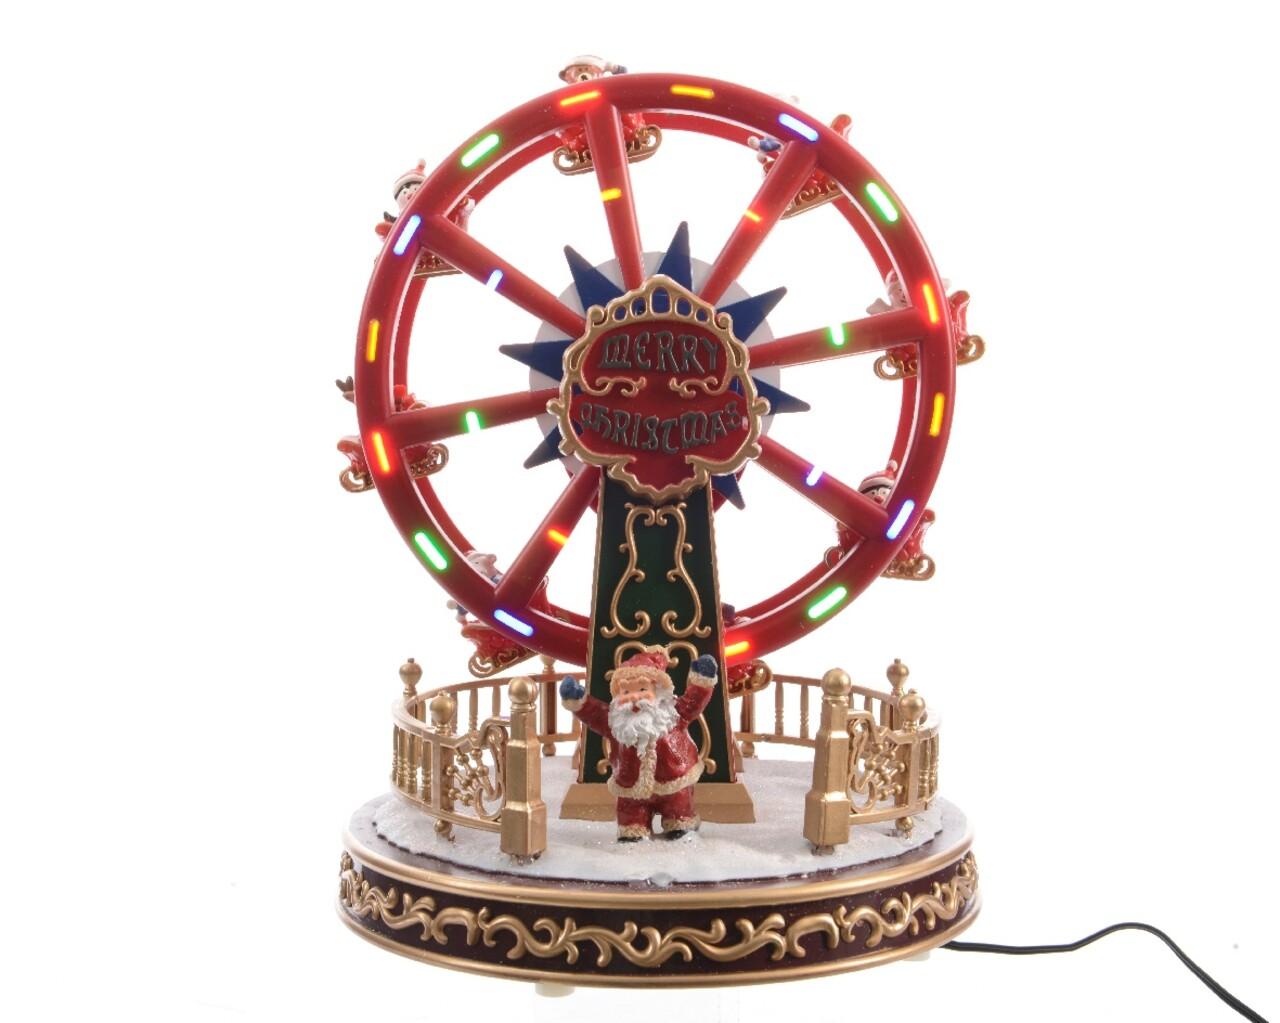 Decoratiune Lumineo, Wheel, cu sunet si lumini,10 LED-uri, multicolor